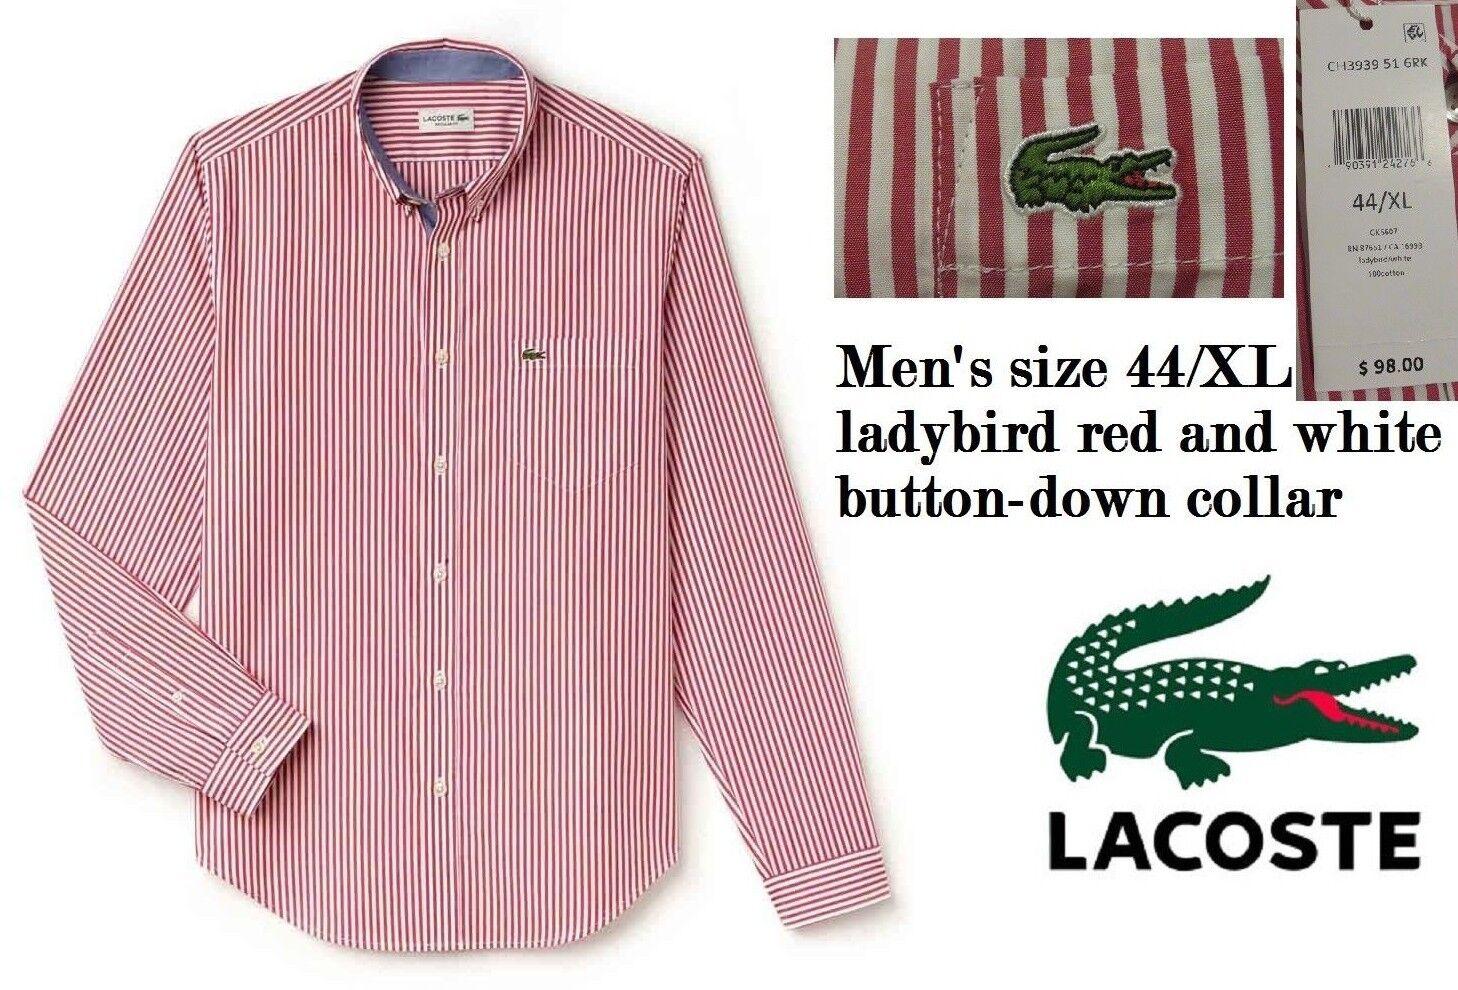 Lacoste  Herren X-Large Long-Sleeve Bengal Stripe Regular Fit Woven Shirt ROT/Weiß